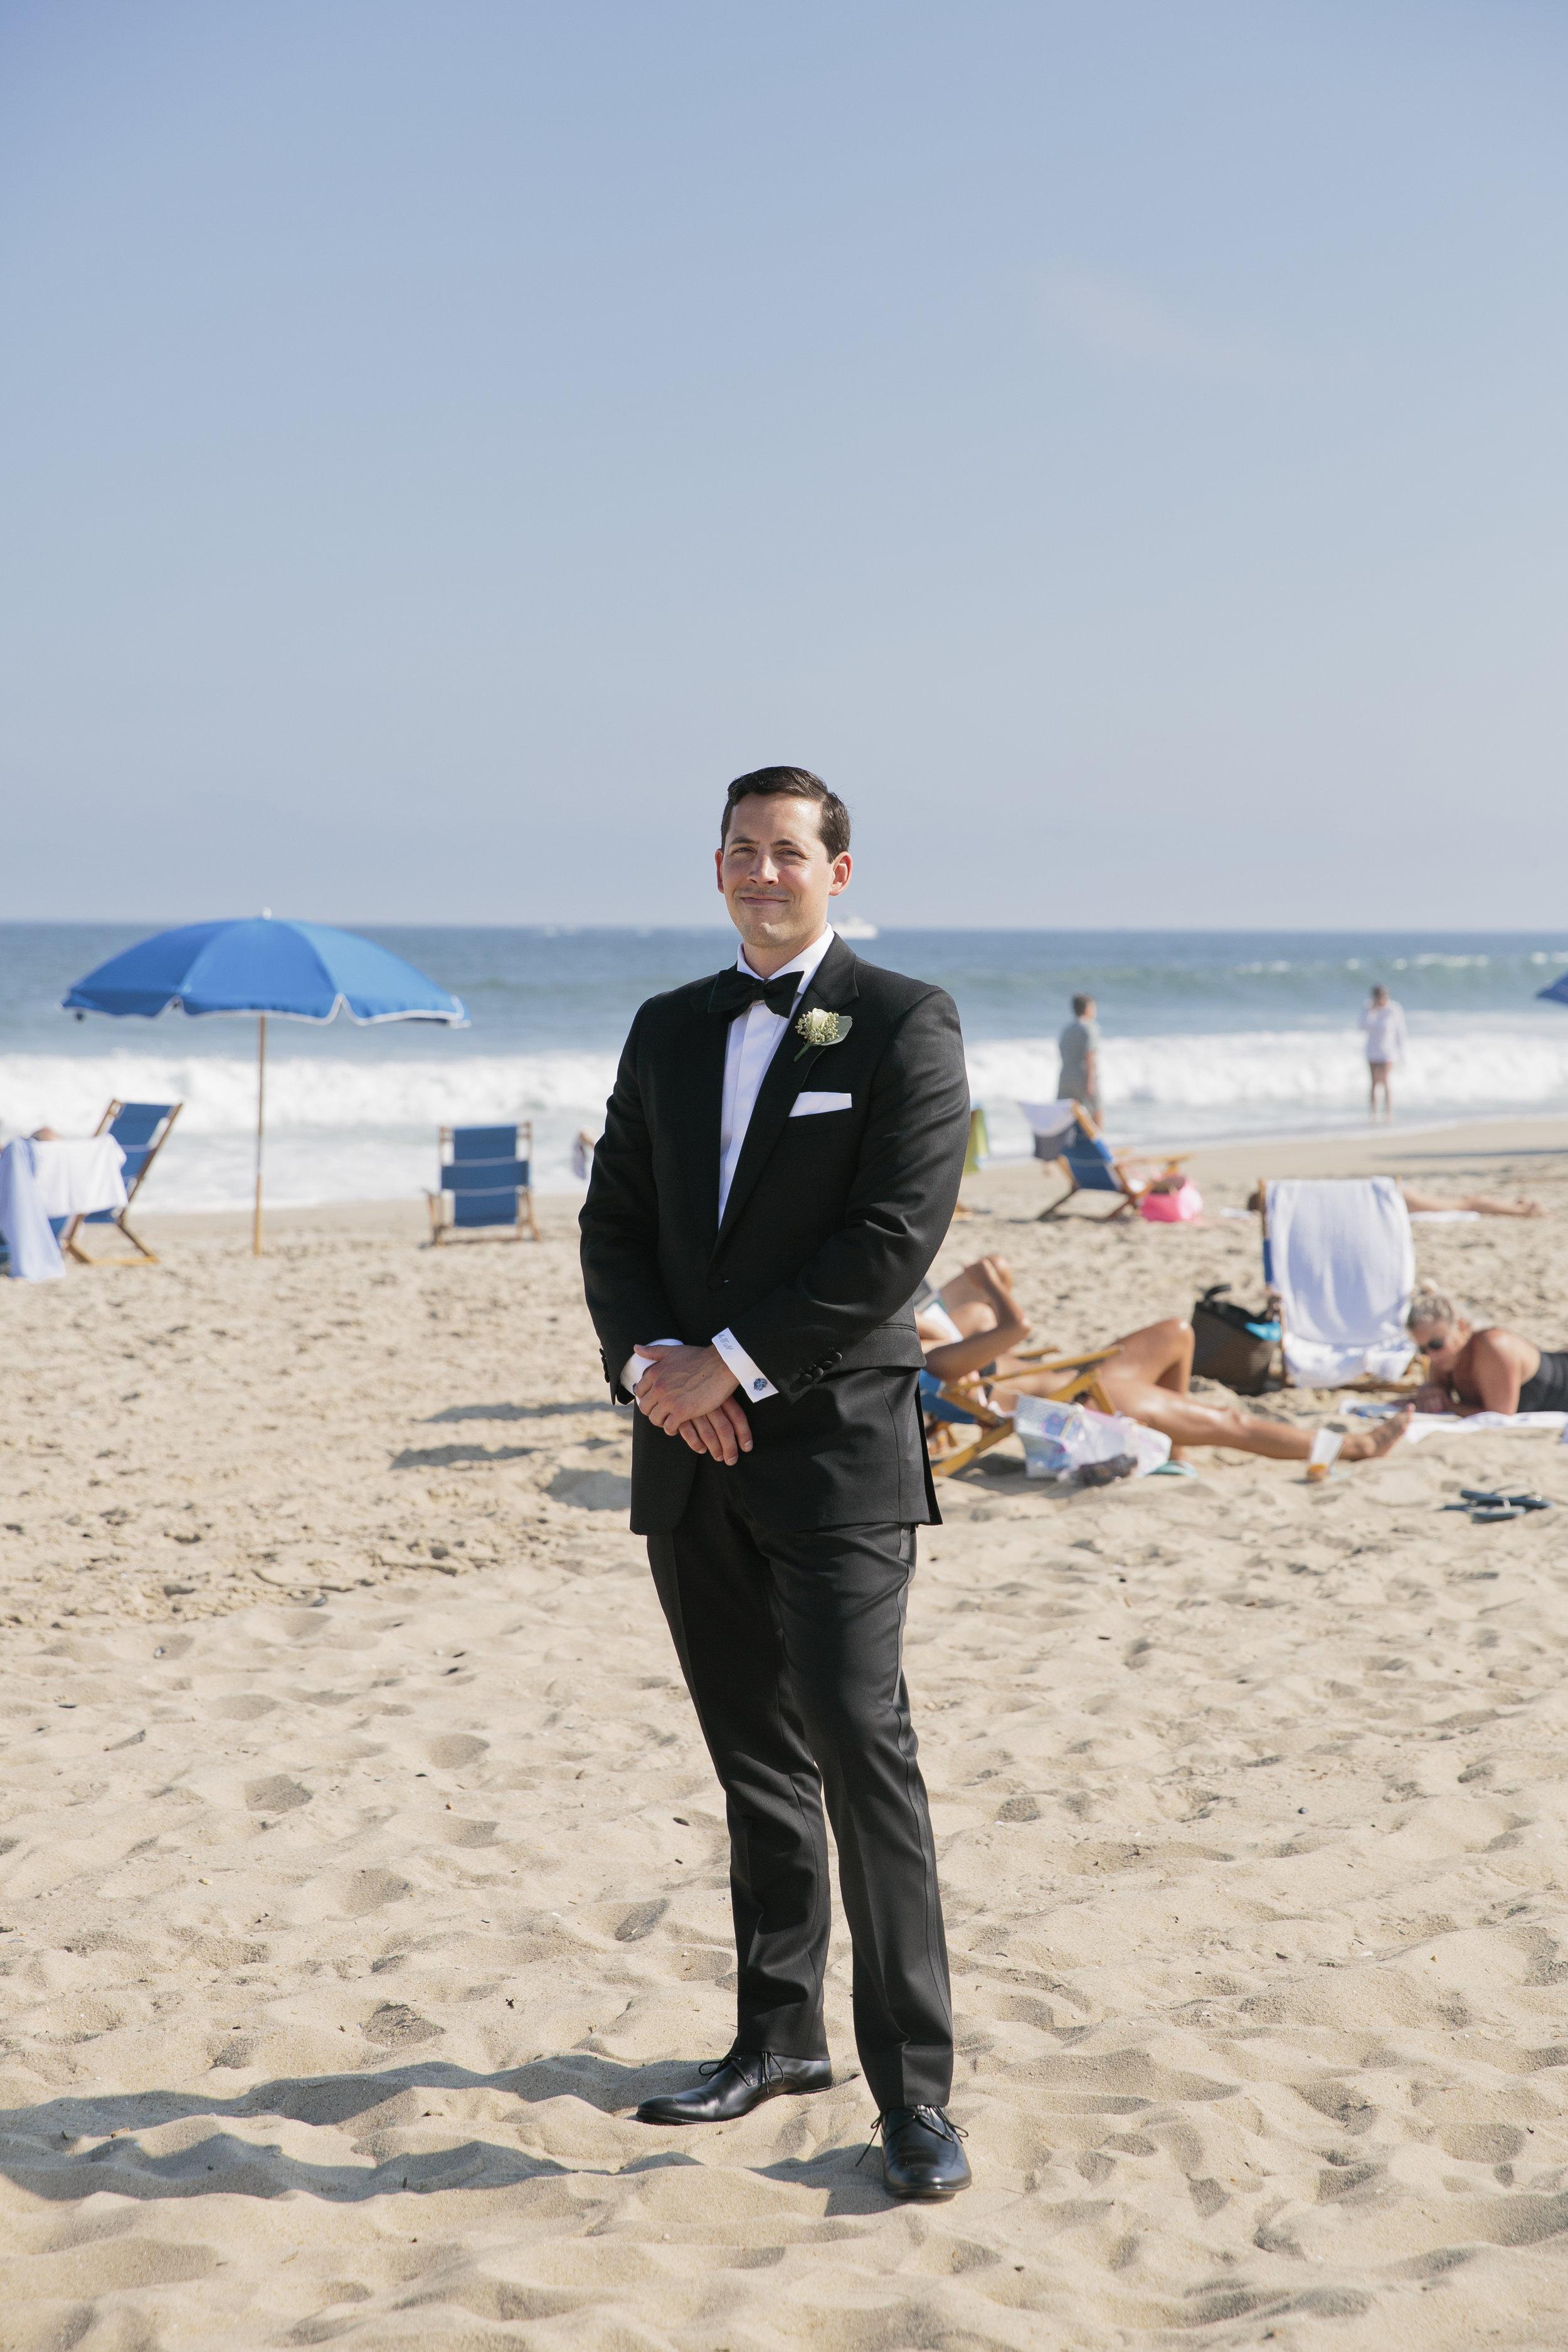 Spring-Lake-New-Jersey-Beach-Wedding-Photographer_139.jpg